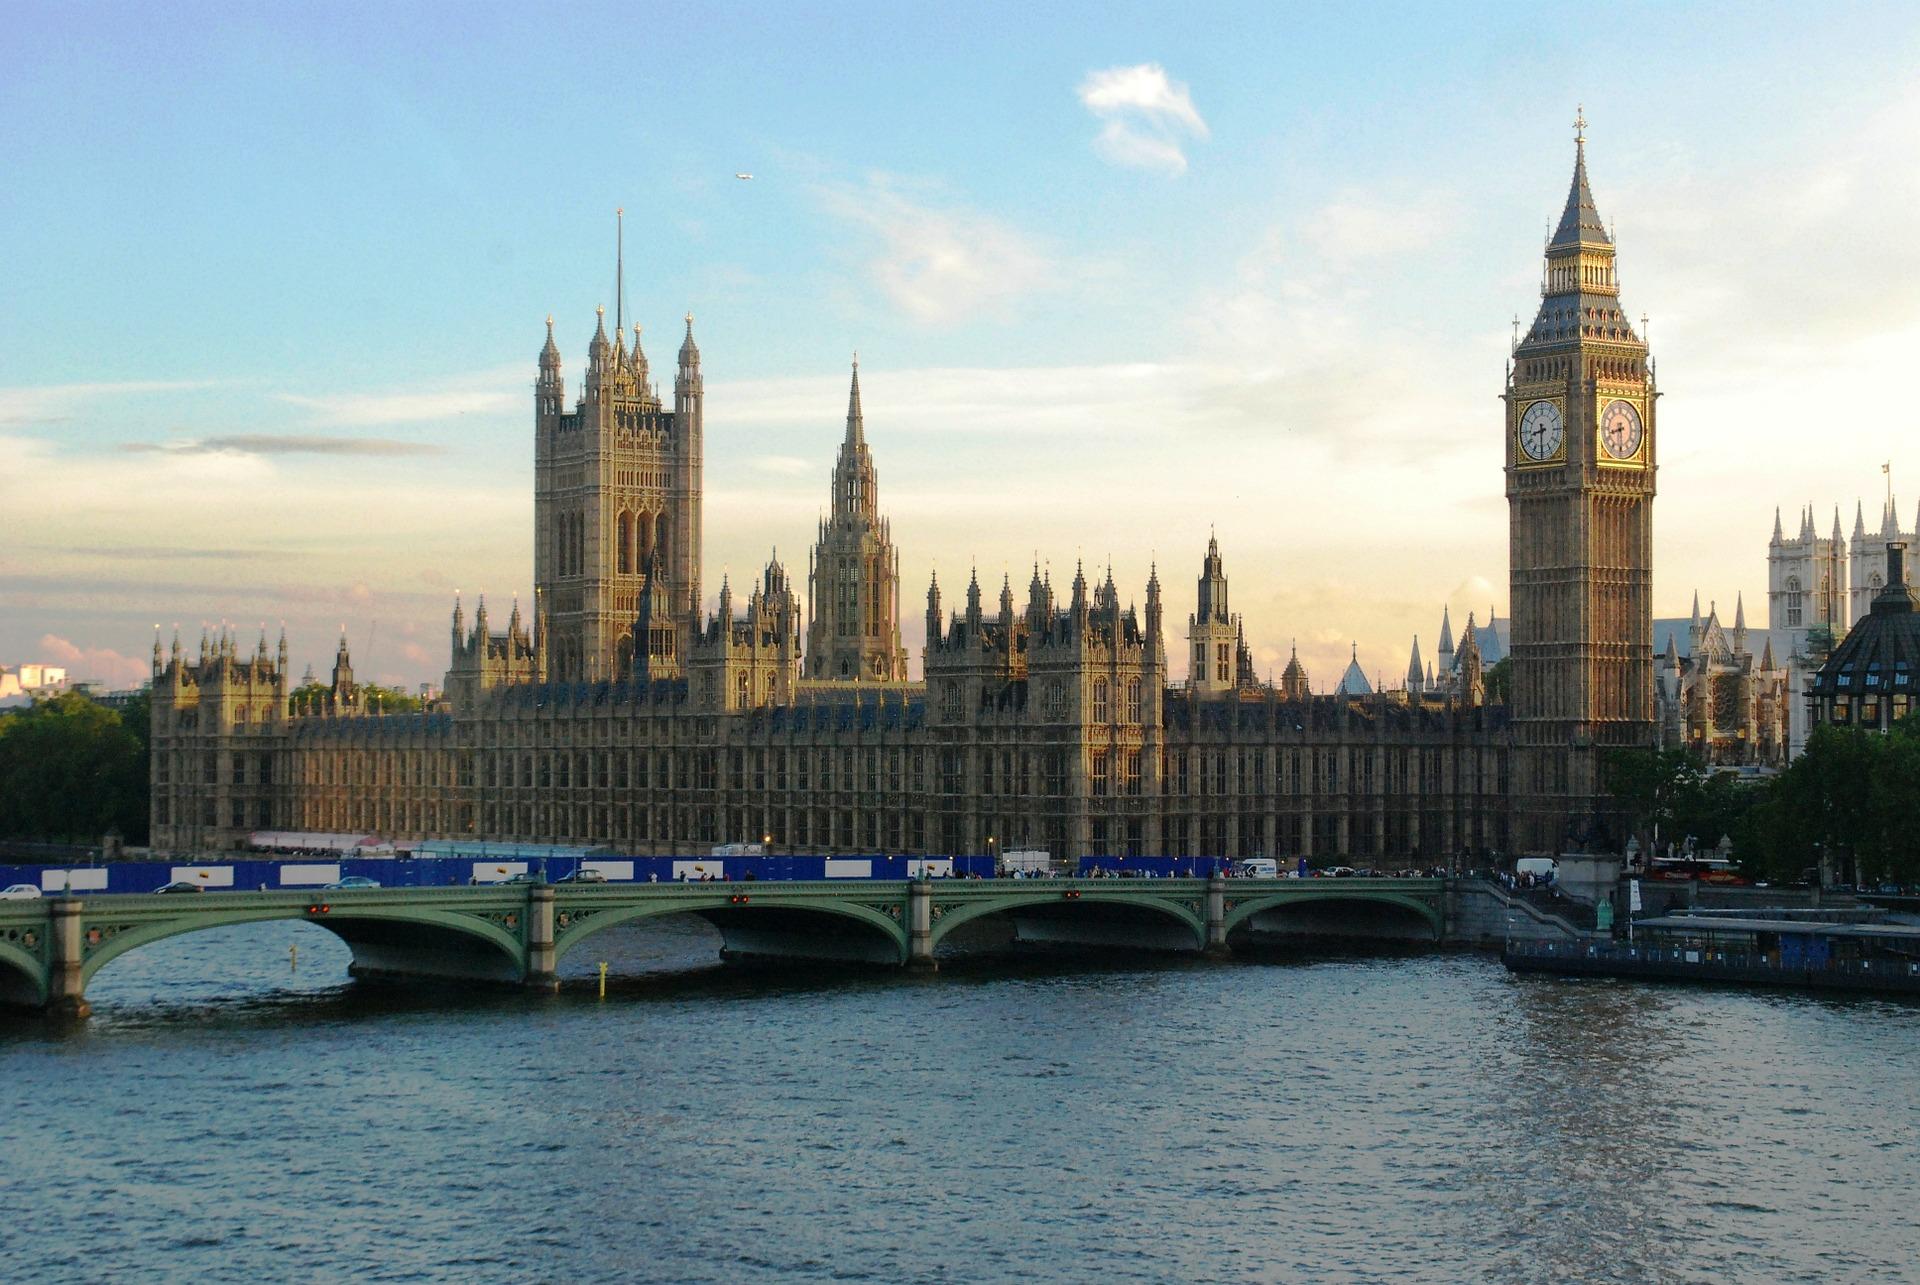 parliament-544751_1920.jpg